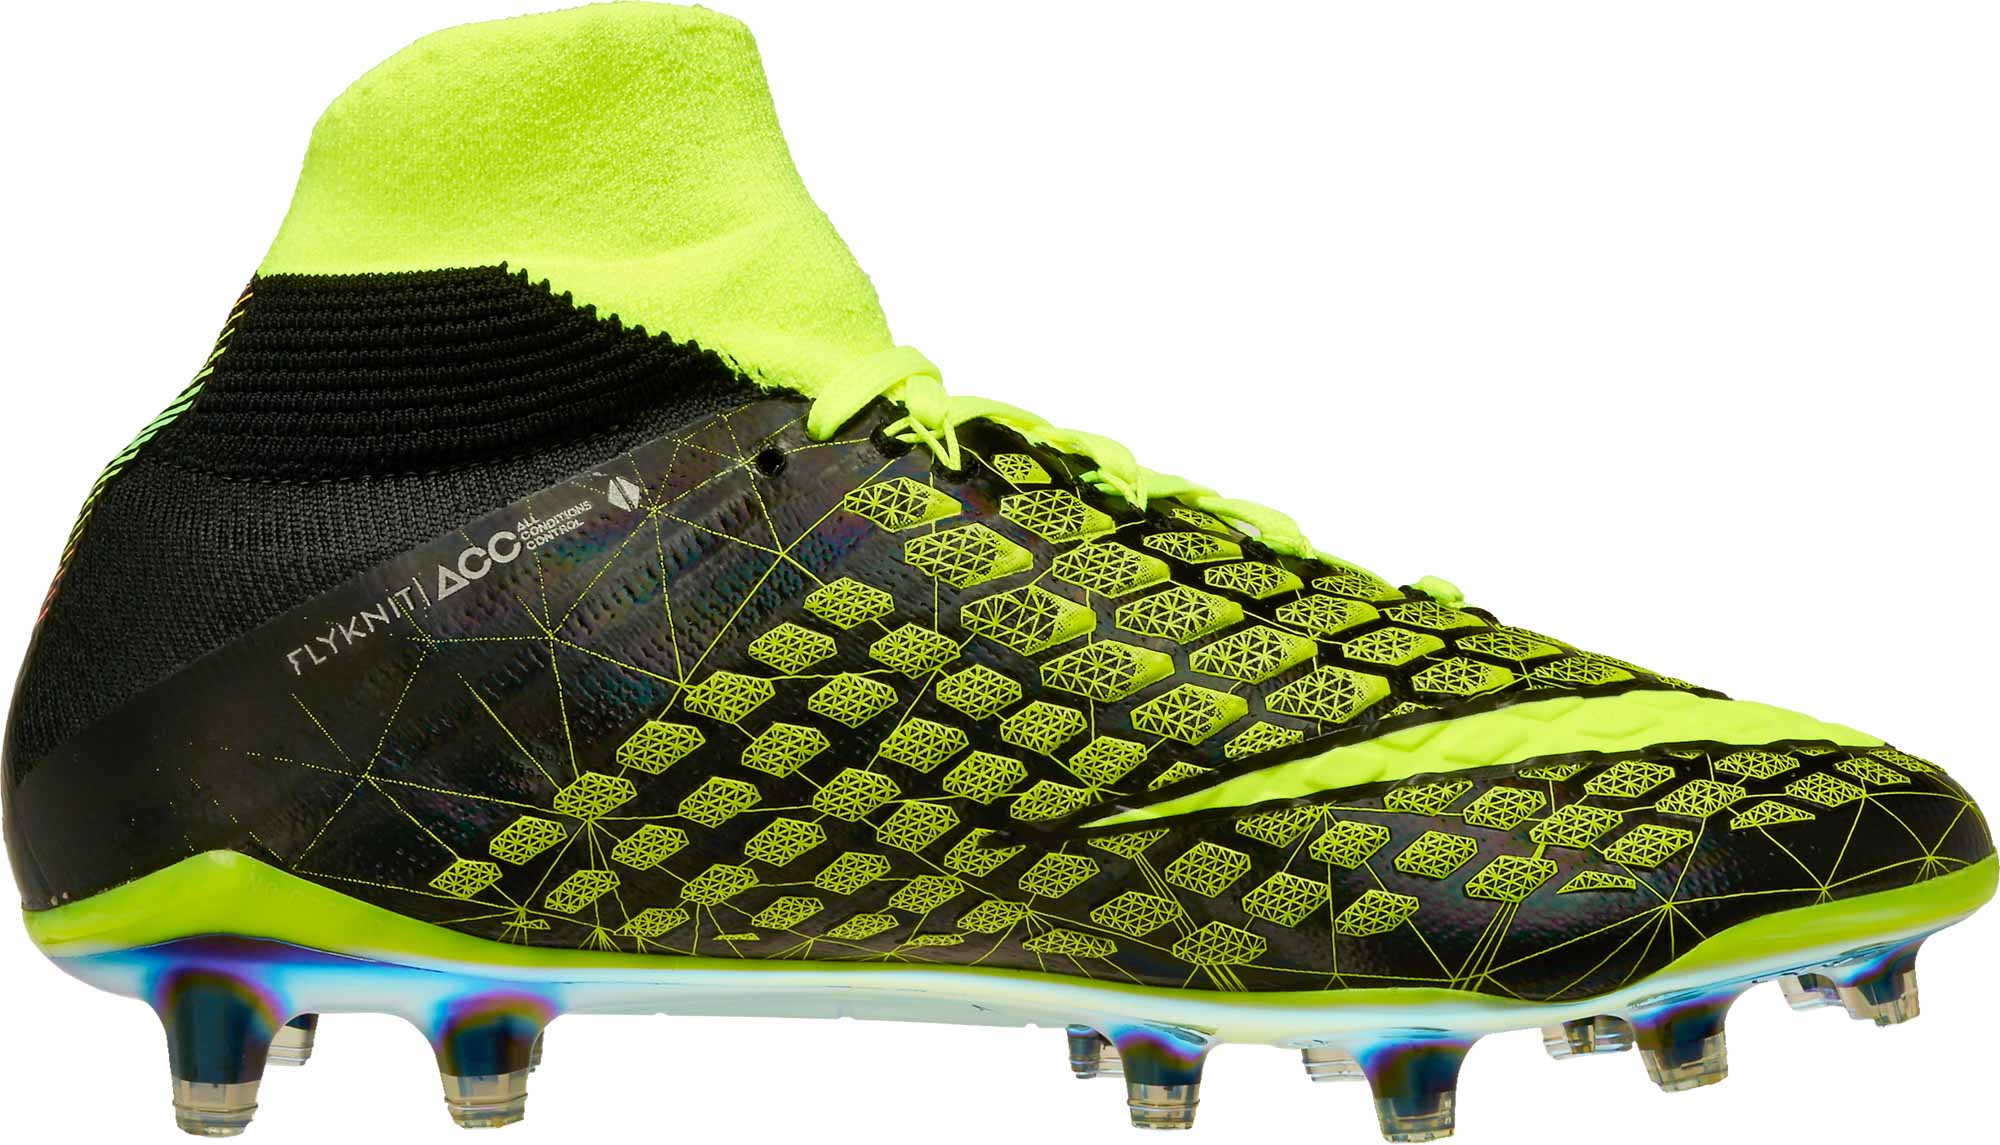 6be2b4aba94c Home   Shop By Brand   Nike Soccer   Nike Soccer Shoes   Nike Hypervenom  Phantom III ...